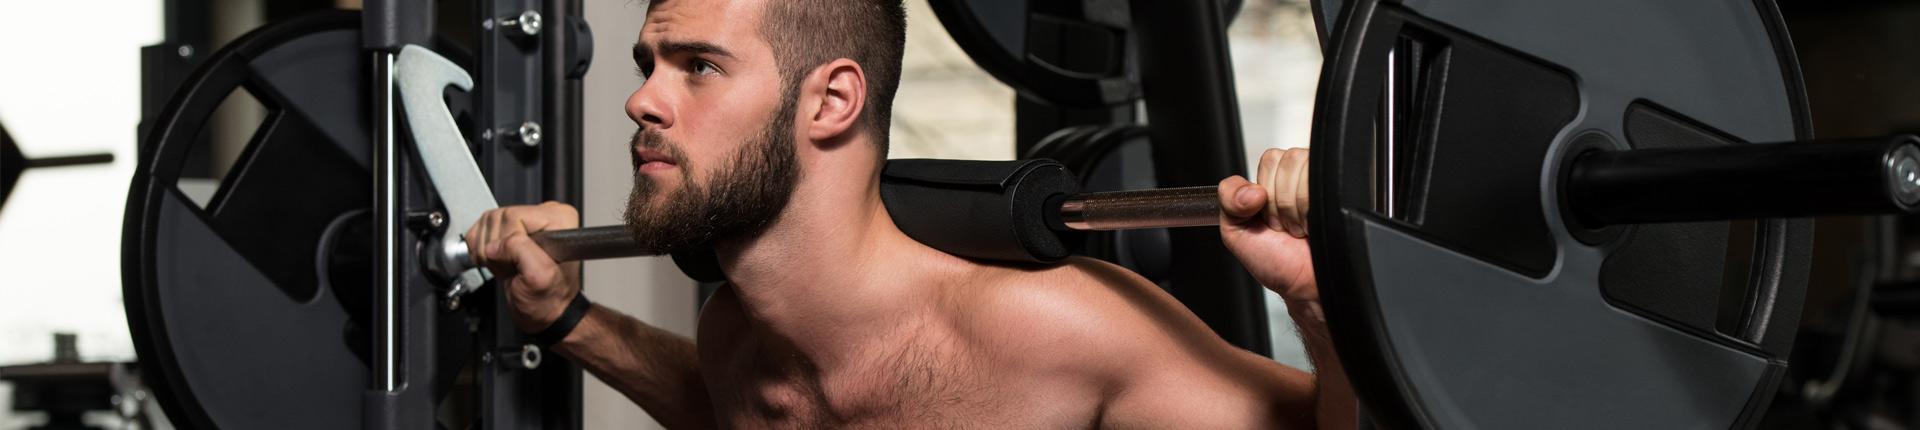 Jaka dieta i trening na początek?